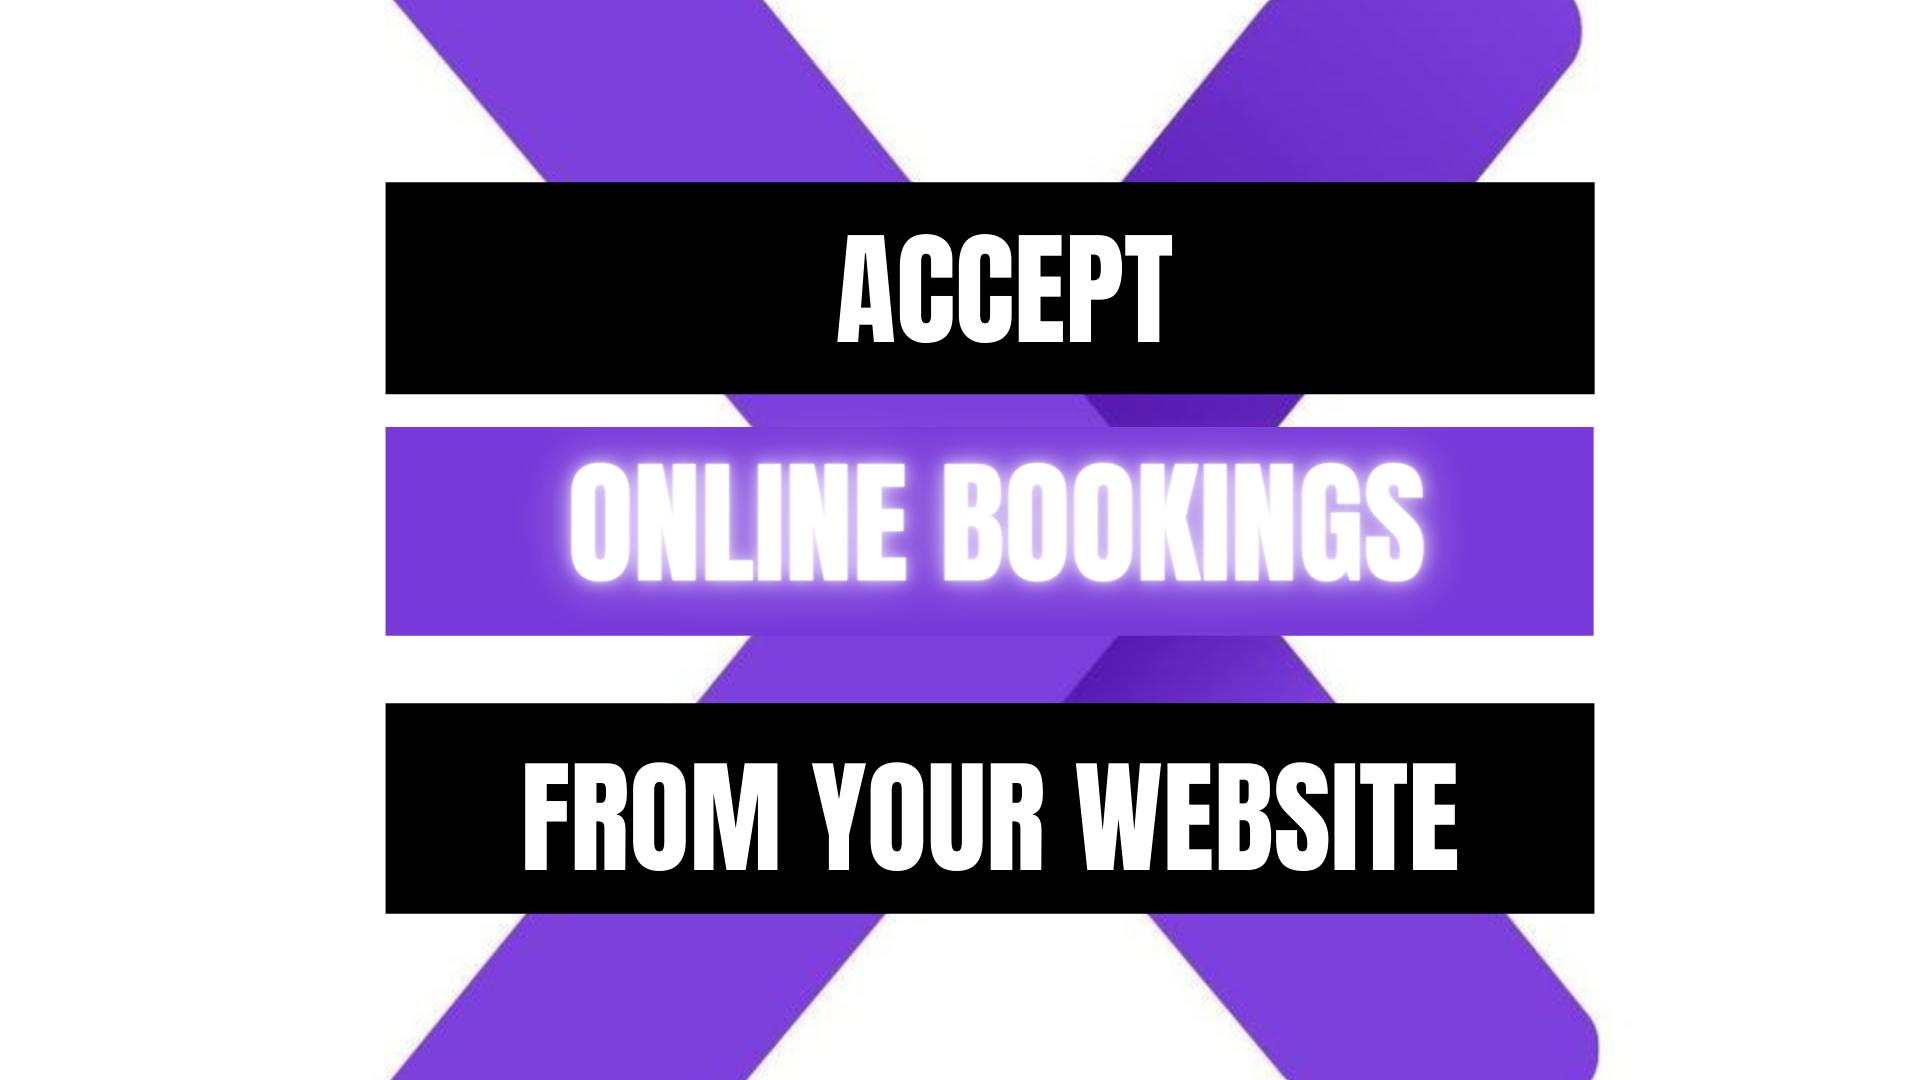 Peekaboox - Accept Bookins from Your Website